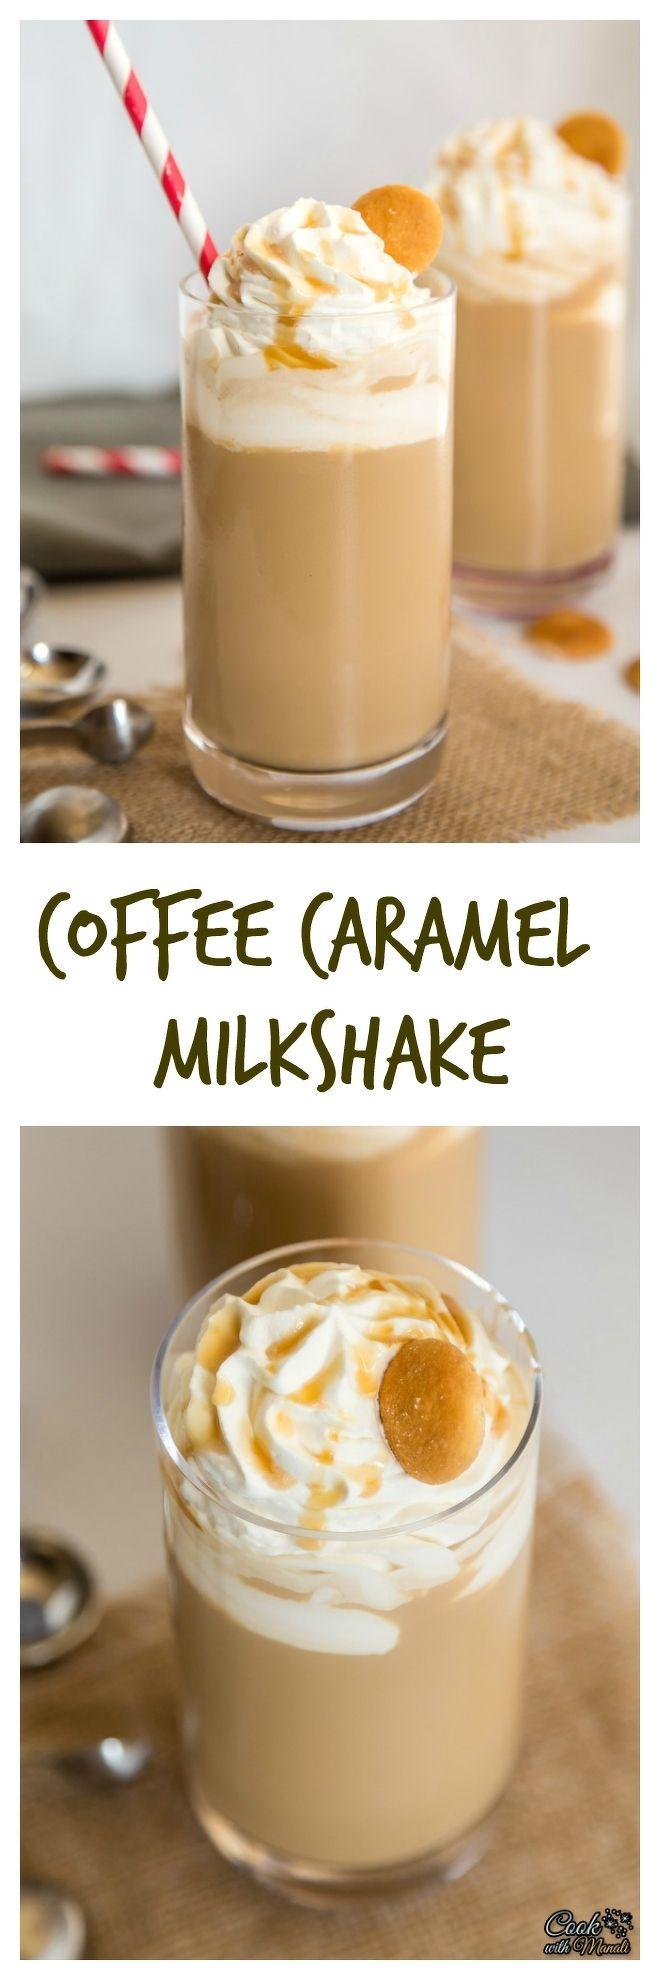 Coffee Caramel Milkshake is a refreshing summer treat to cool off!